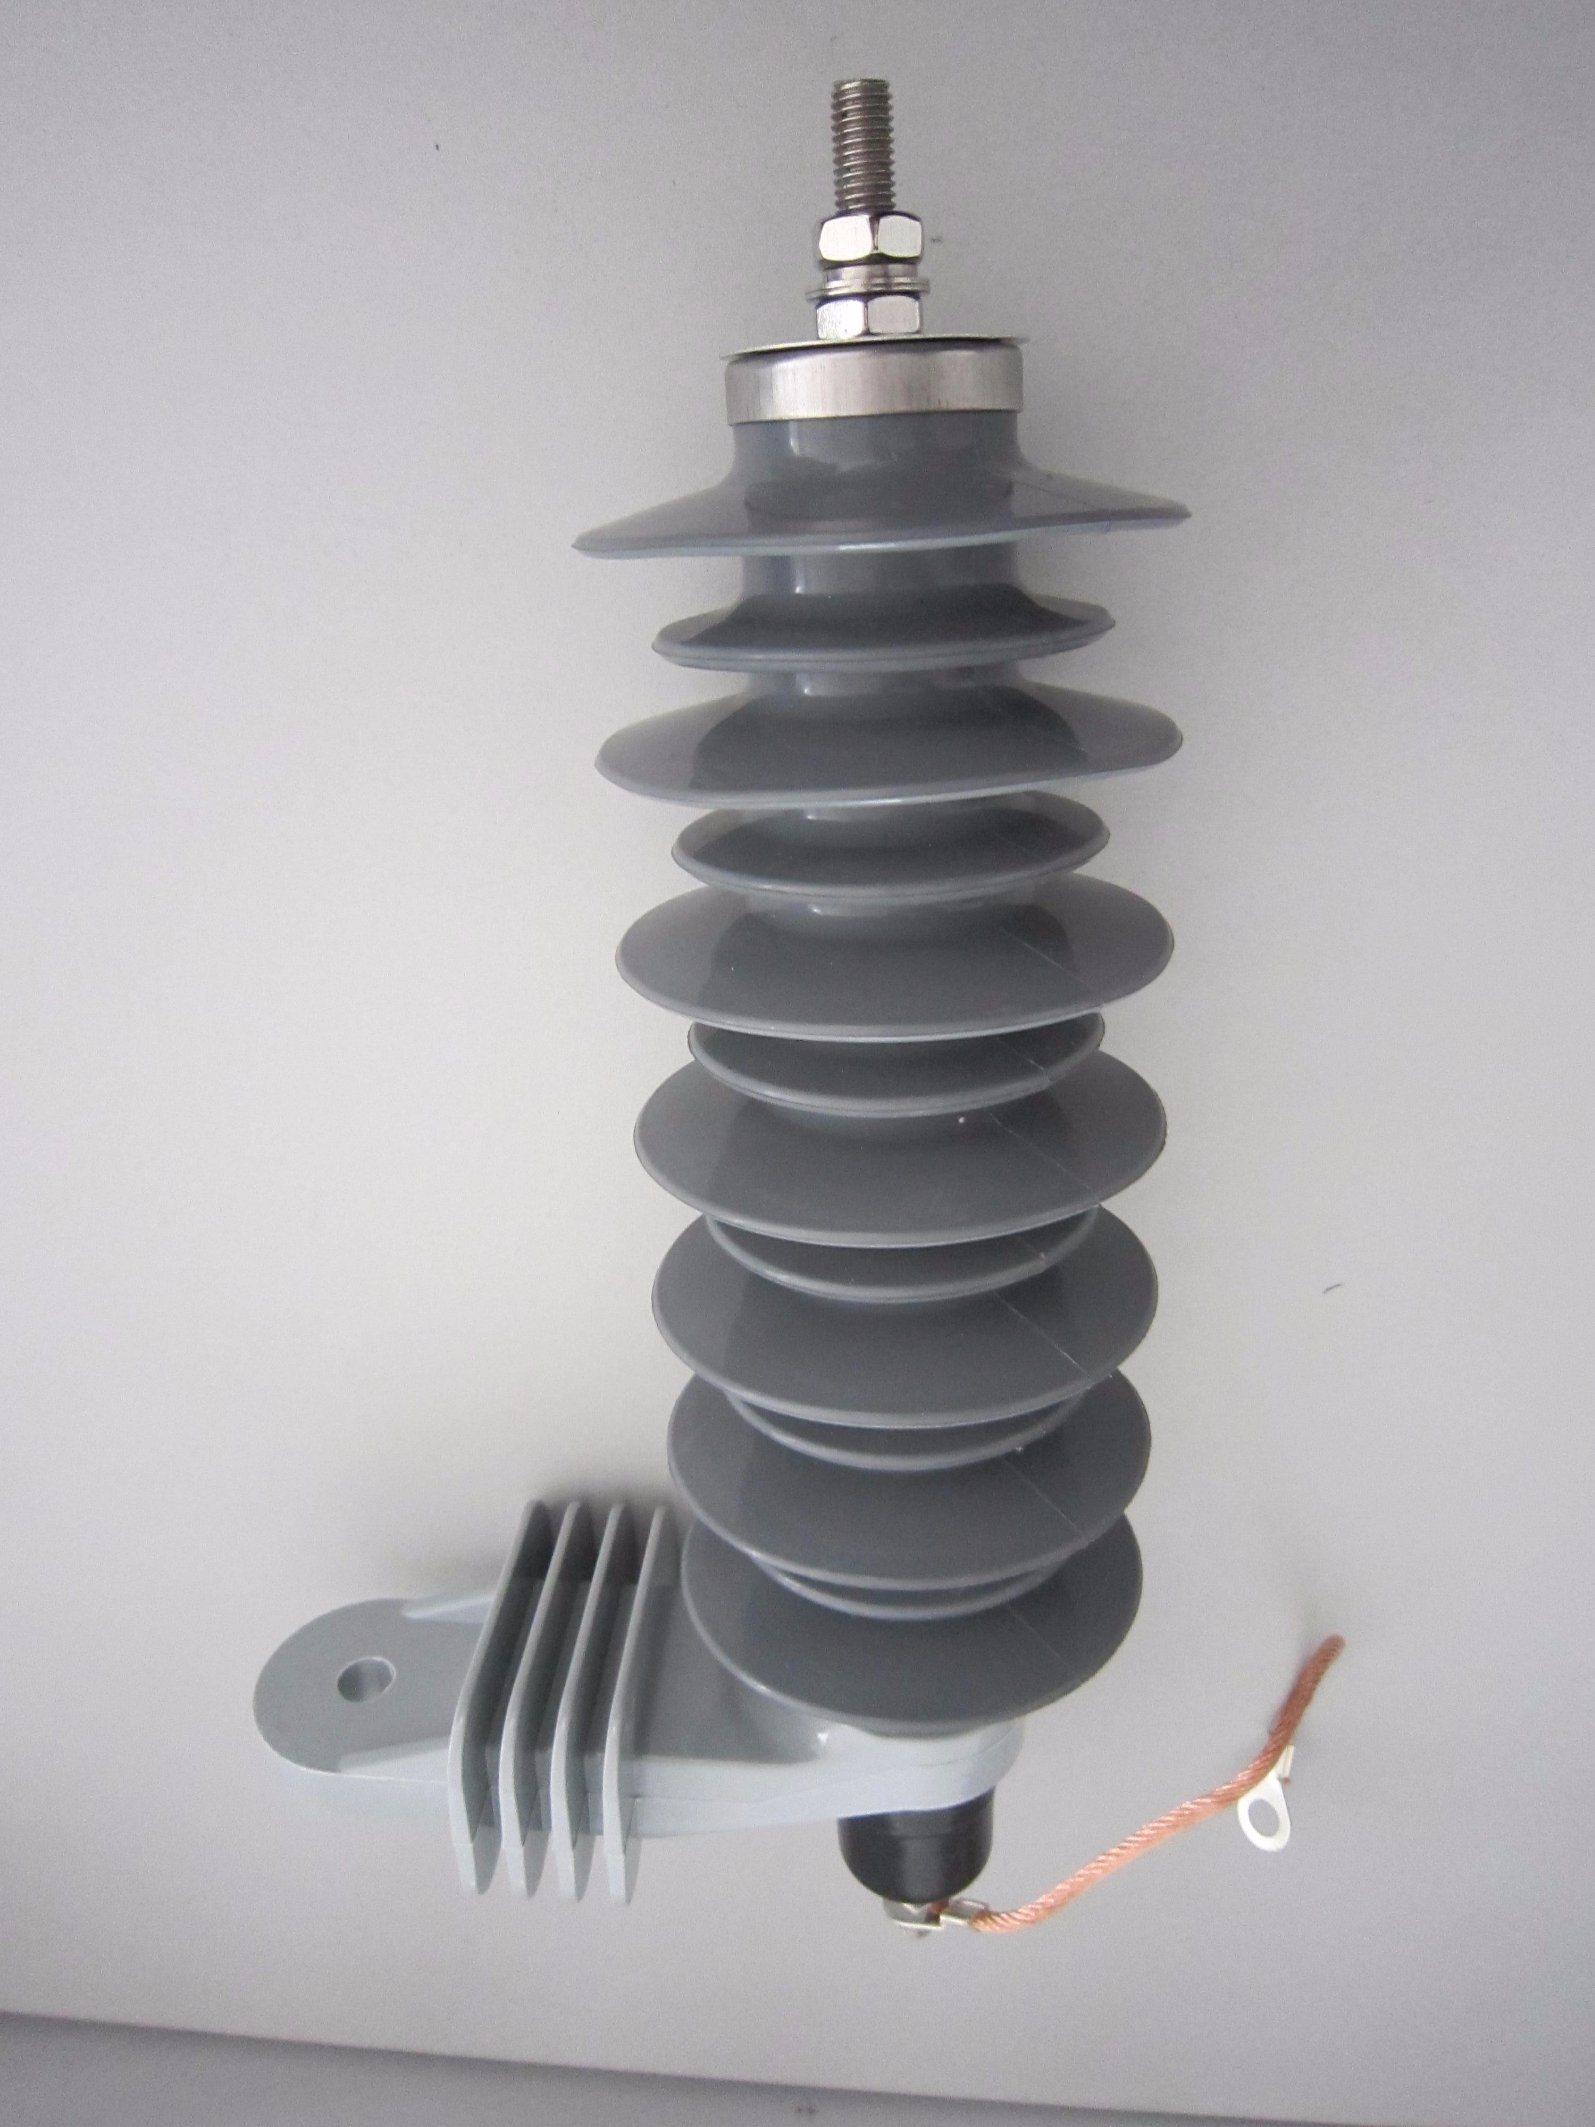 10kA 24kV Polymer Housd Metal / Zinc Oxide Surge Arrester /Protector